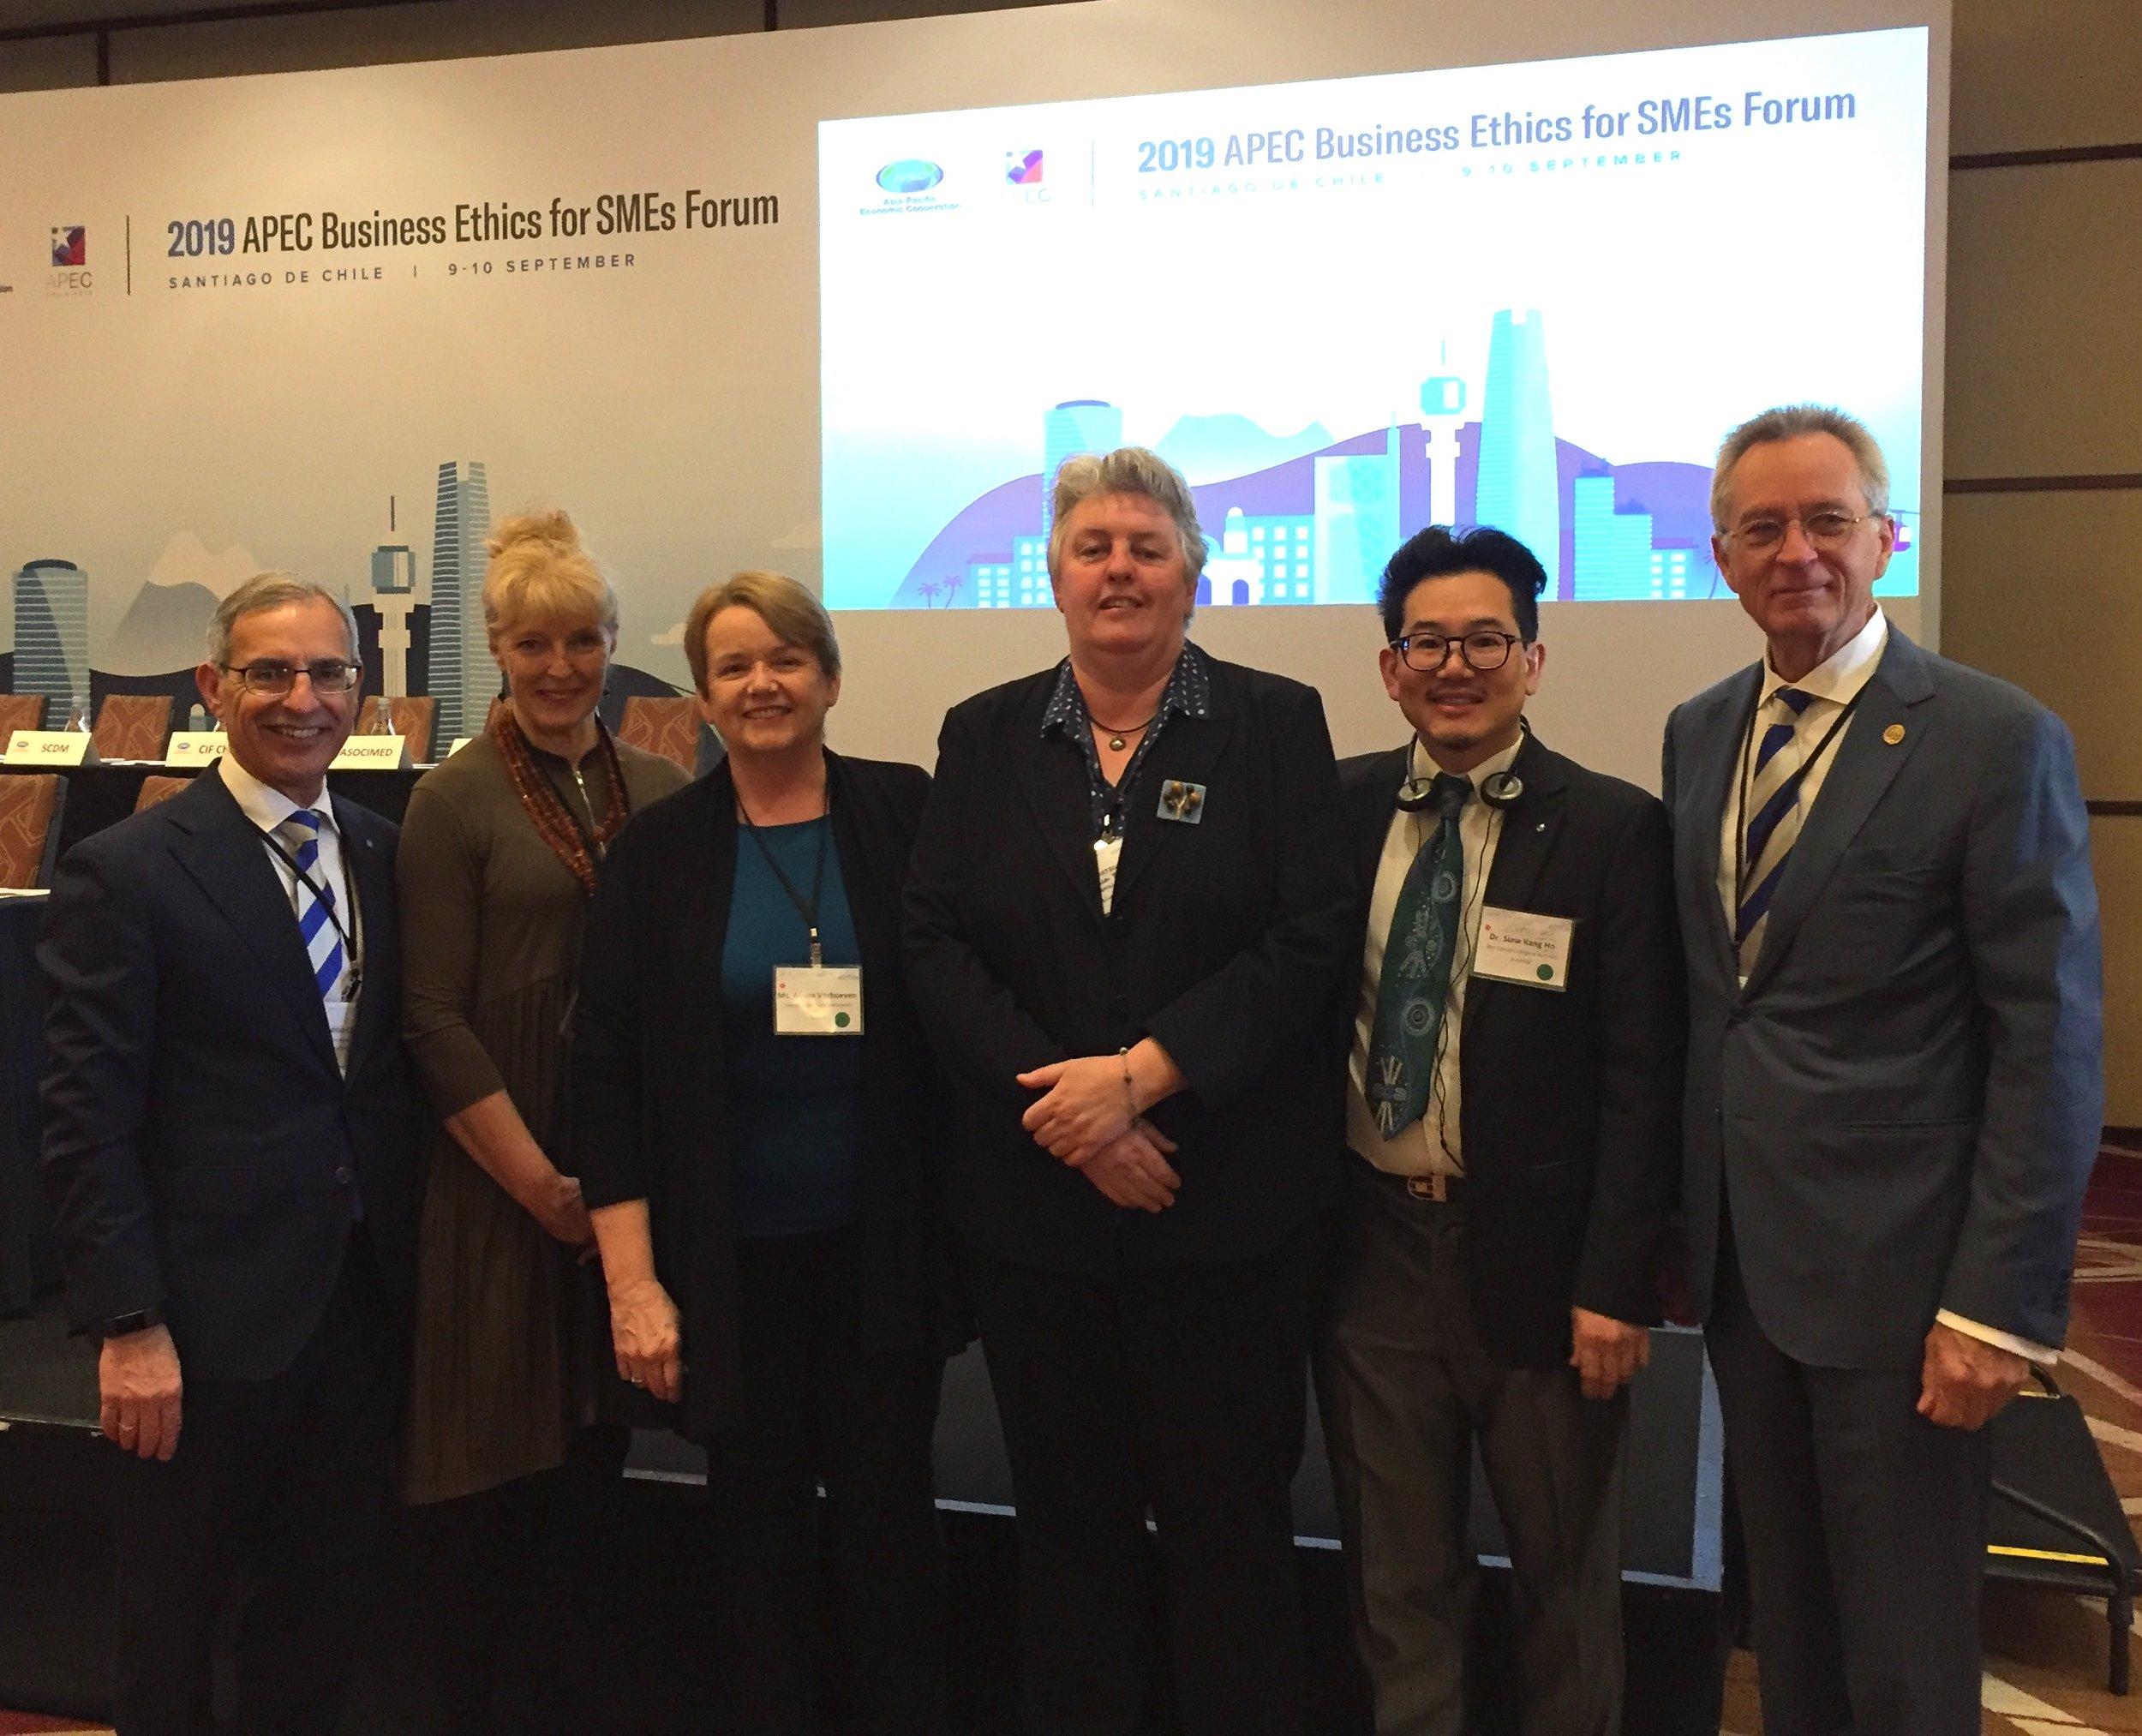 AEHA representatives at the 2019 APEC Business Ethics for SMEs Forum